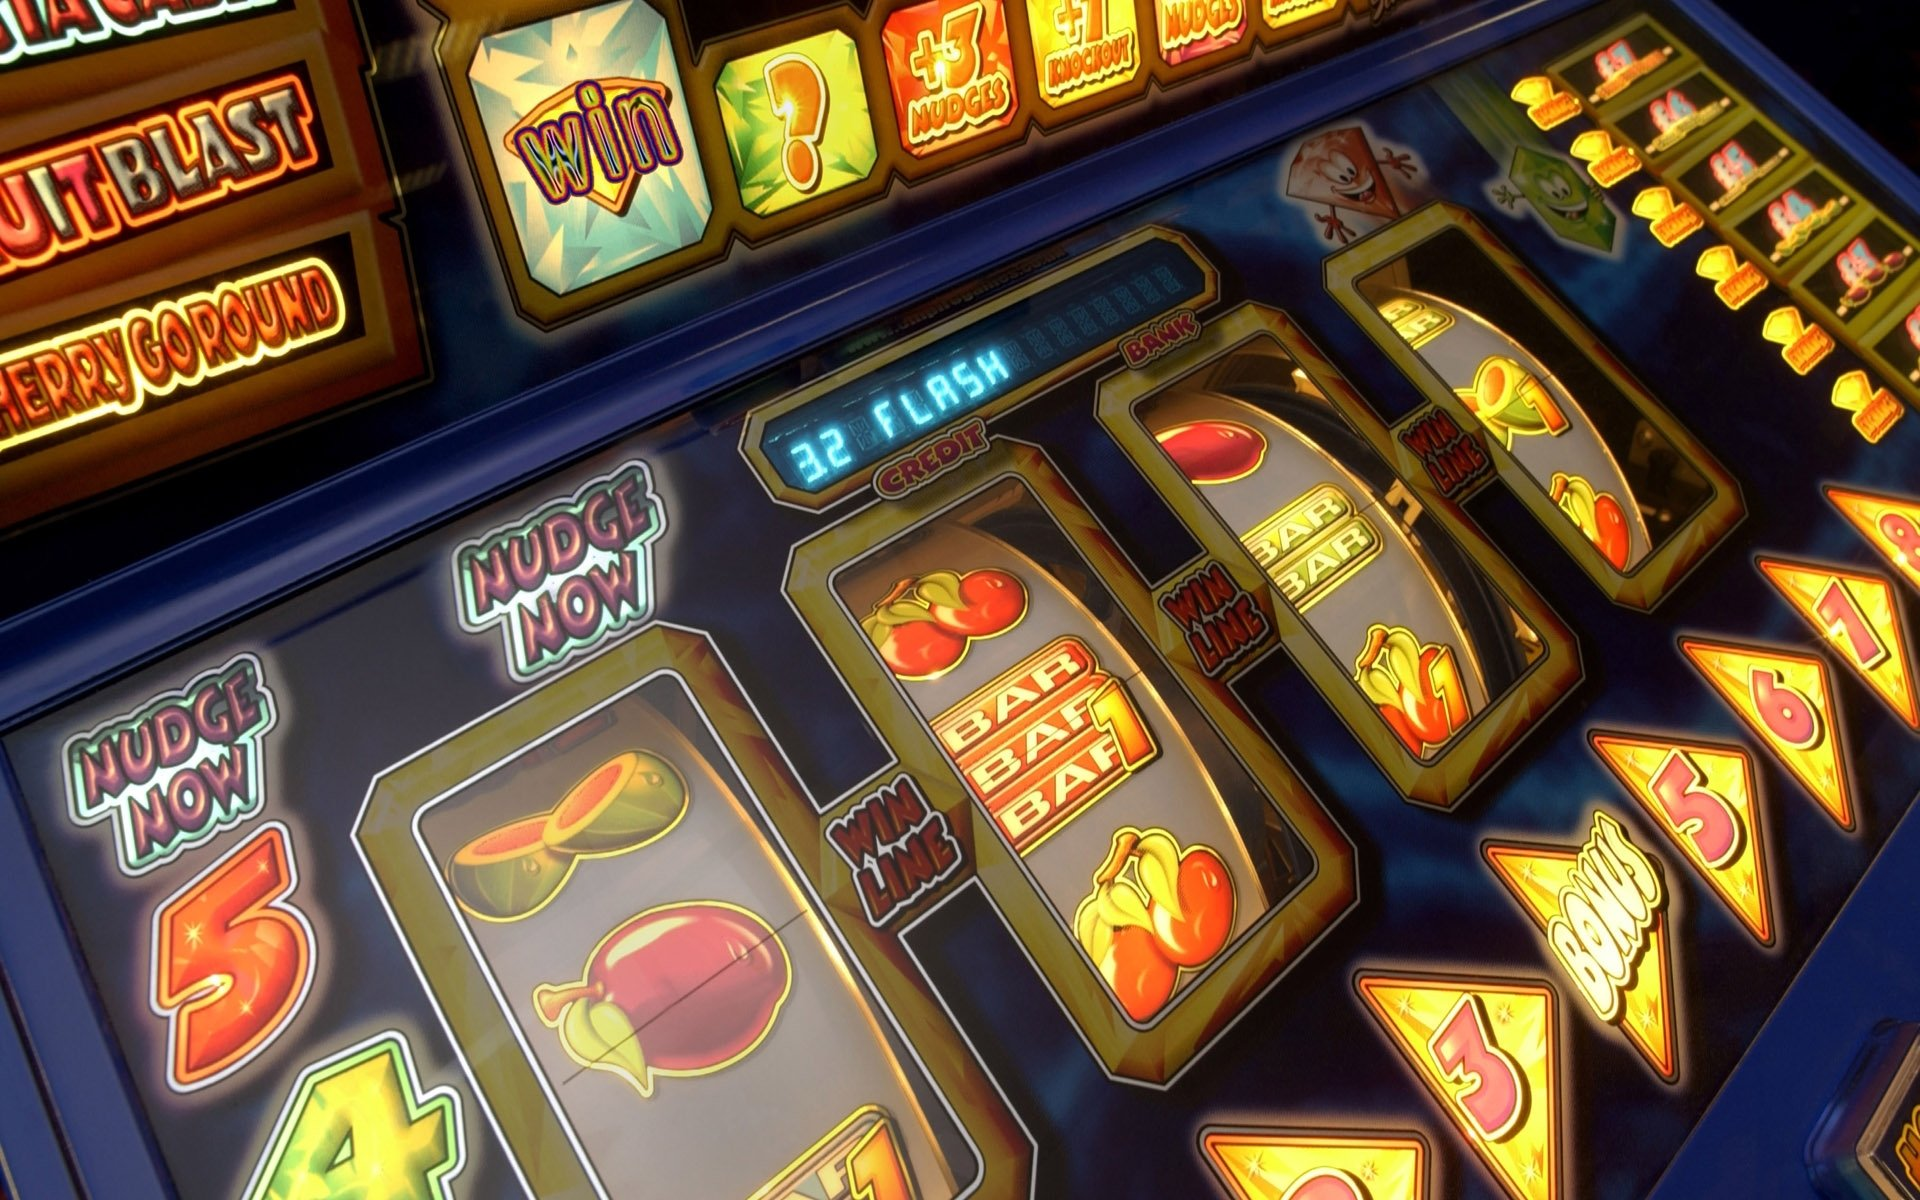 Seven Methods To Avoid Casino Burnout